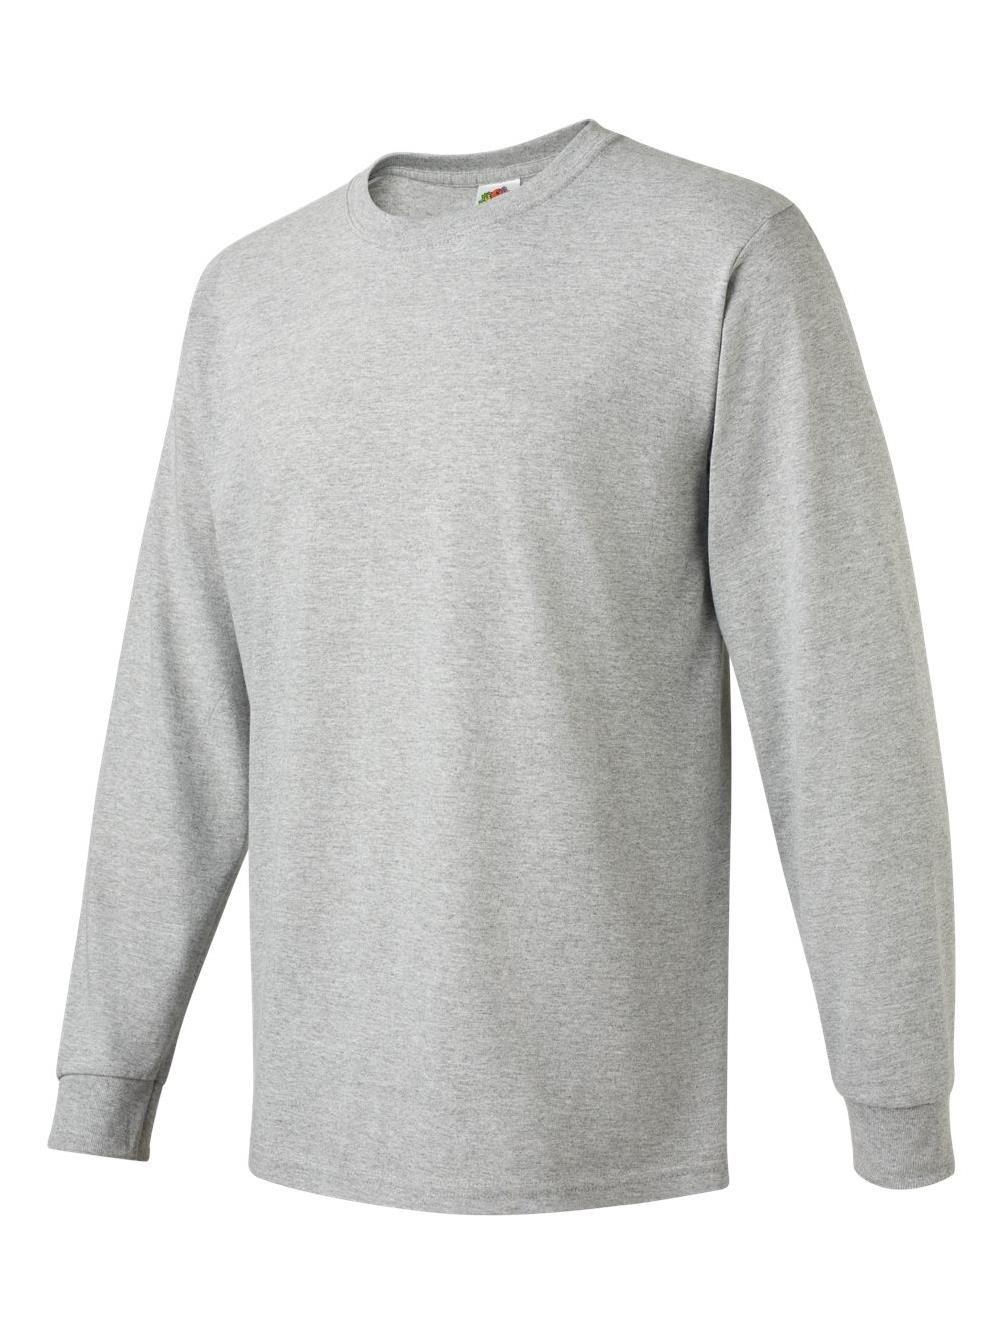 f55cef30 Fruit of the Loom 4930R HD Cotton Long Sleeve T-Shirt#HD, #Fruit, #Loom